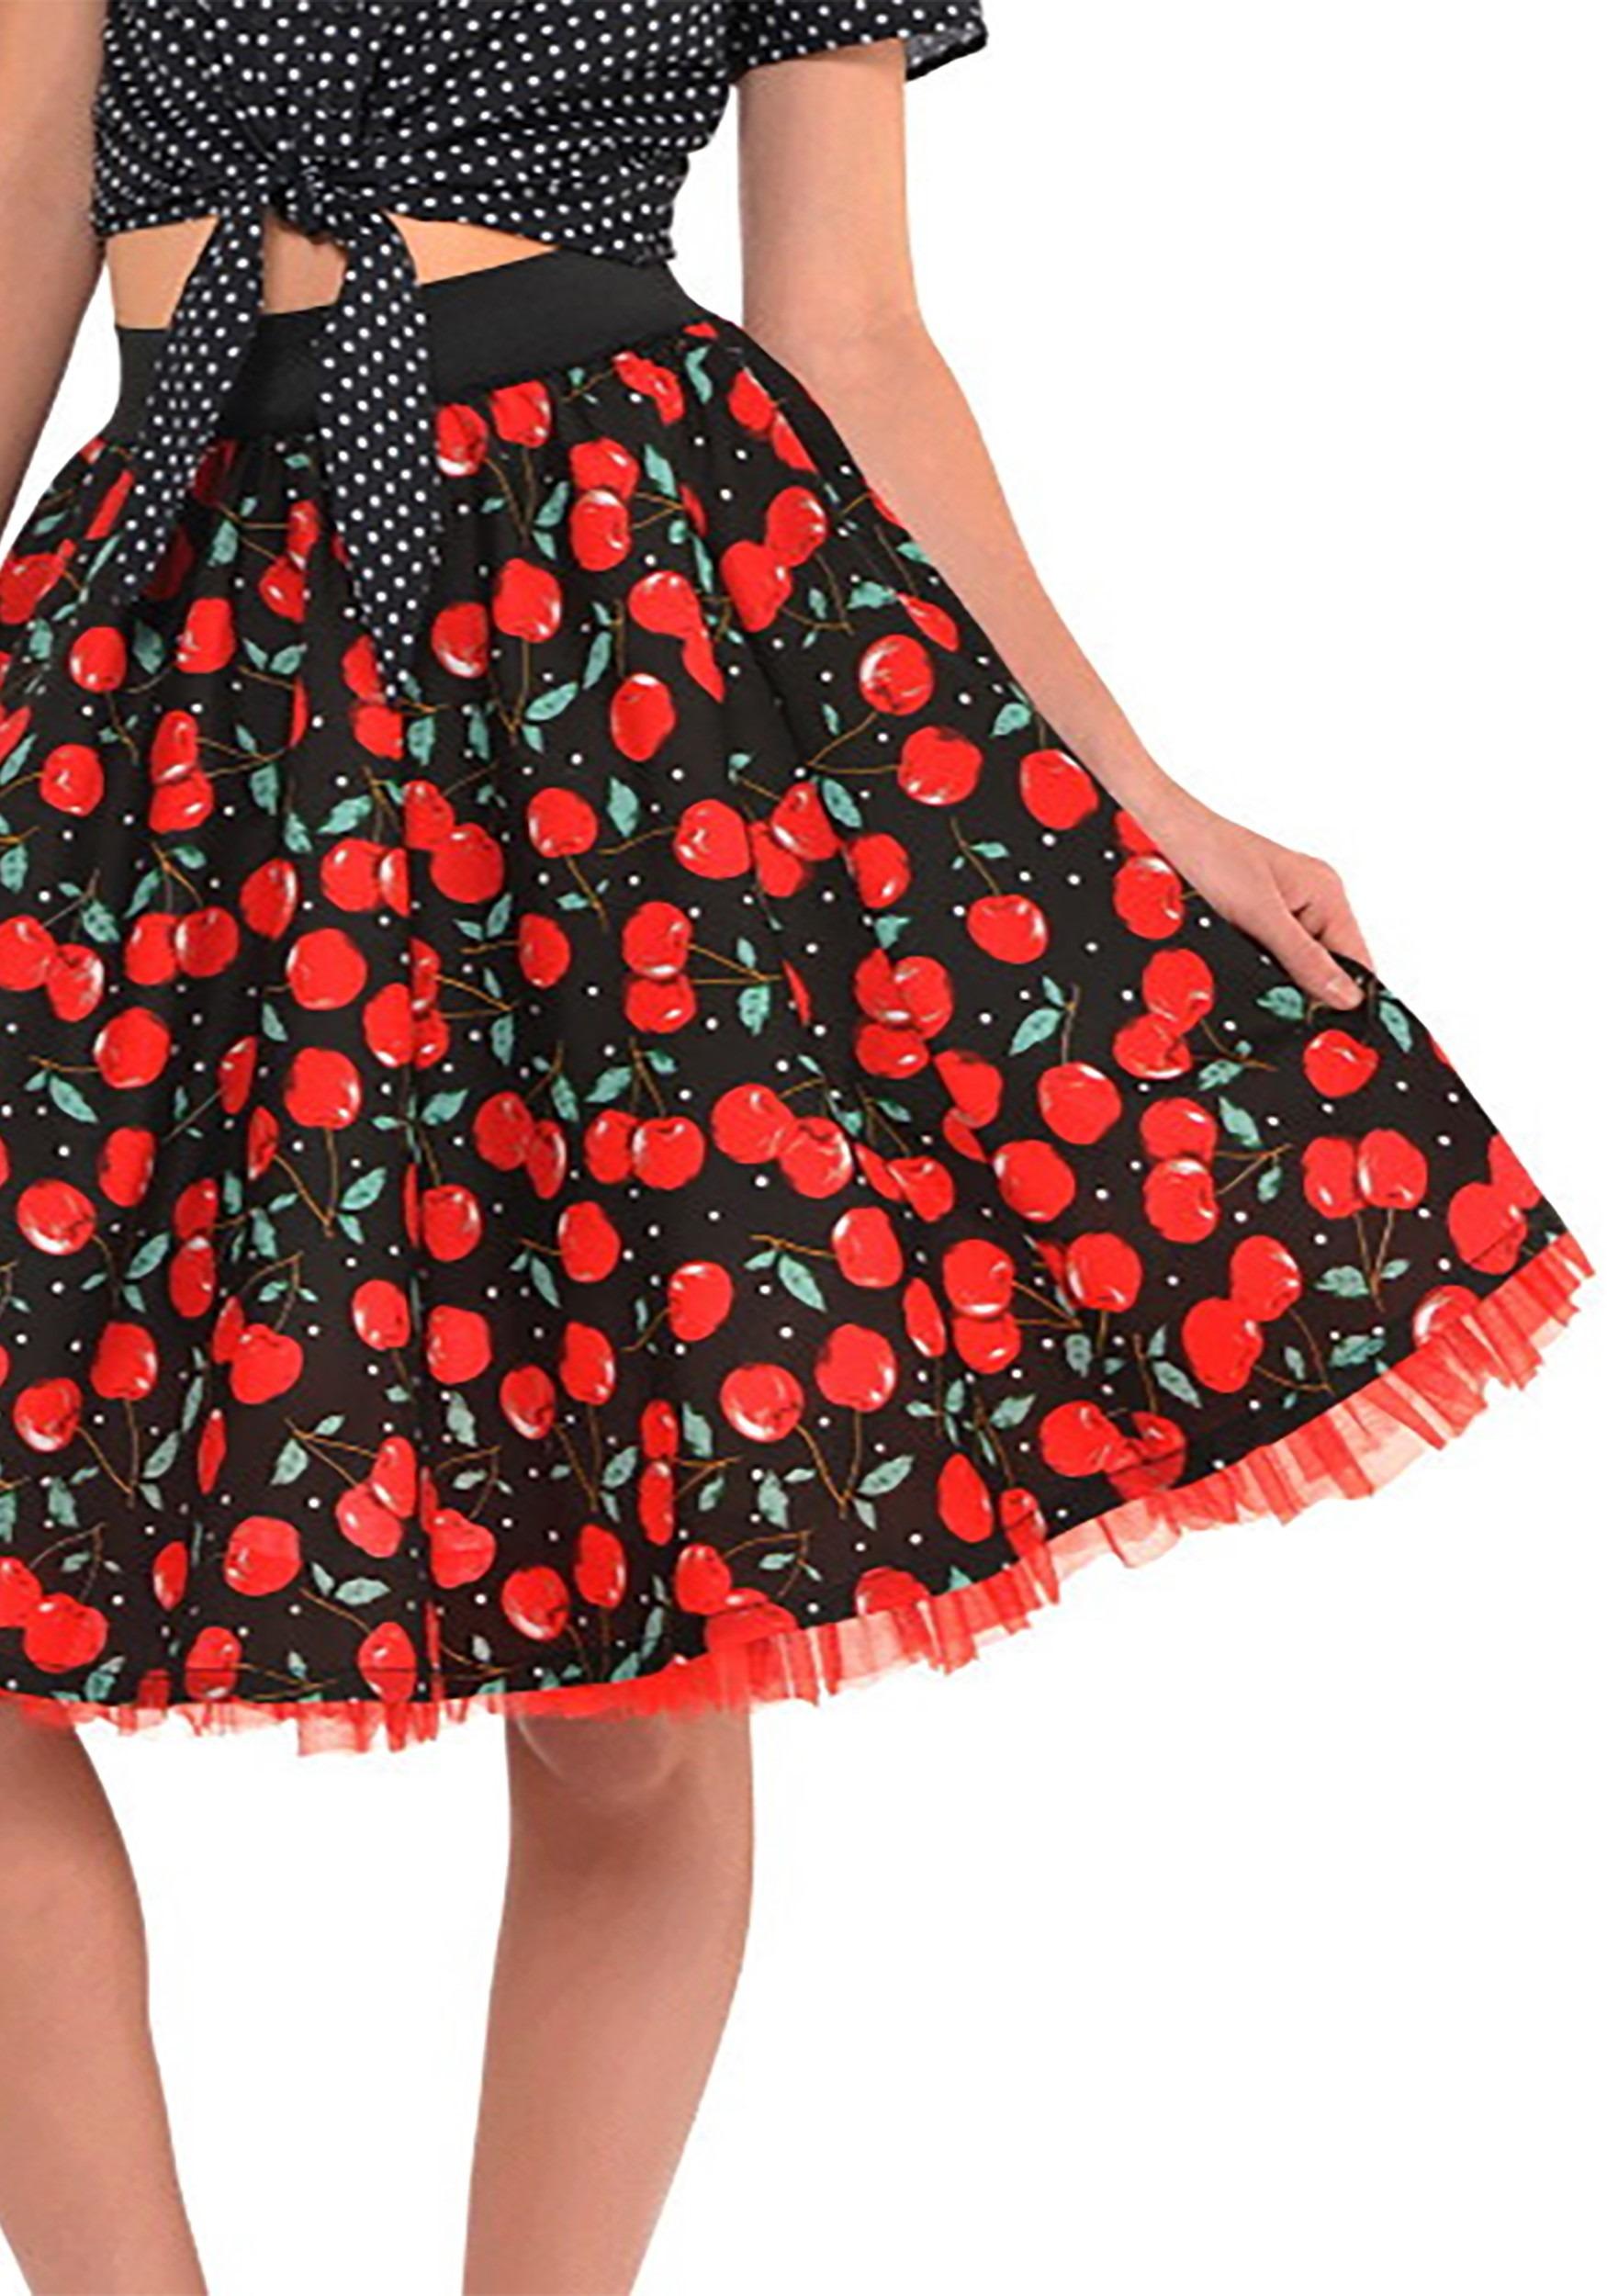 Rockabilly_Cherry_Themed_Skirt